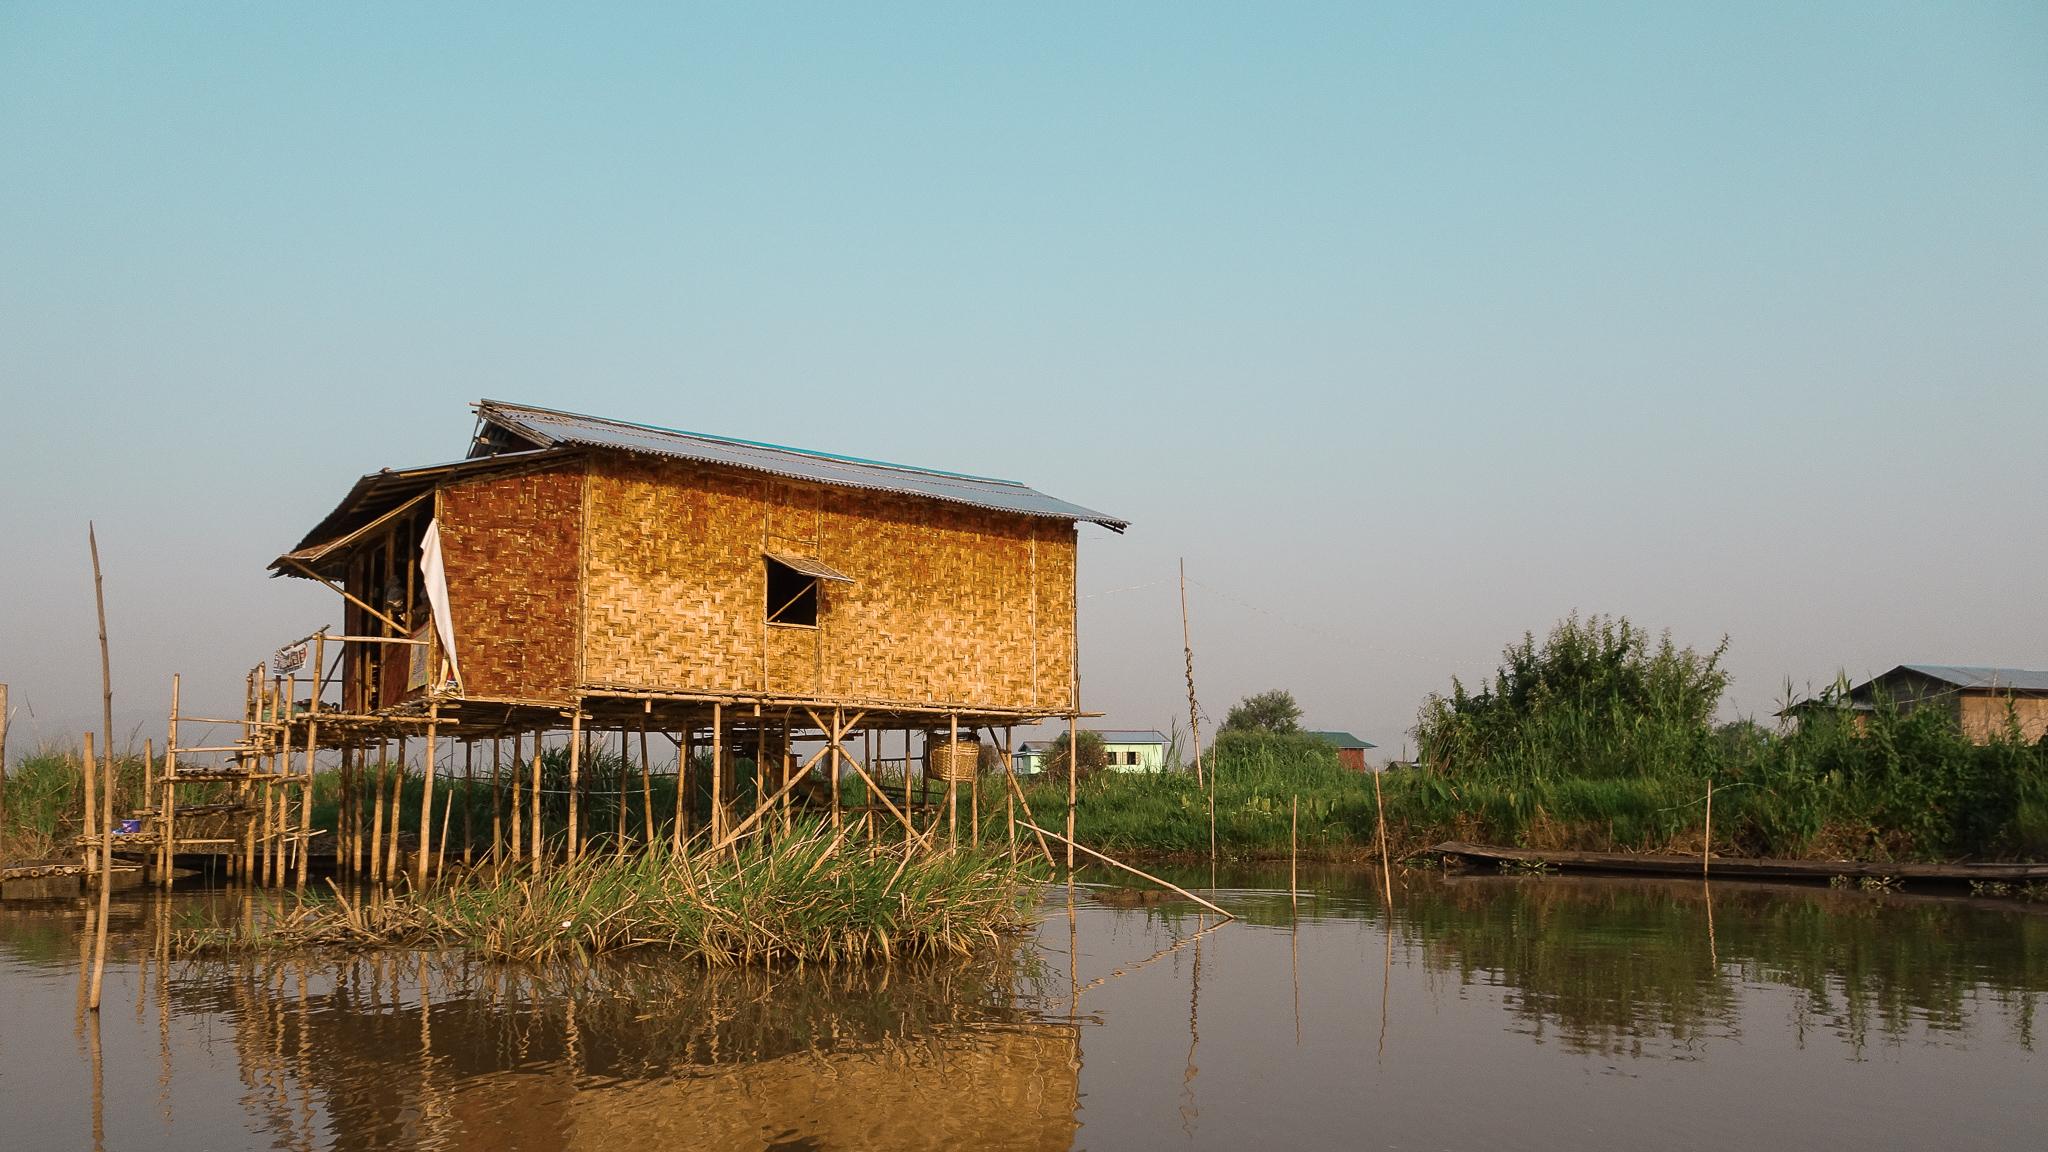 Stilt house, Inle Lake, Myanmar